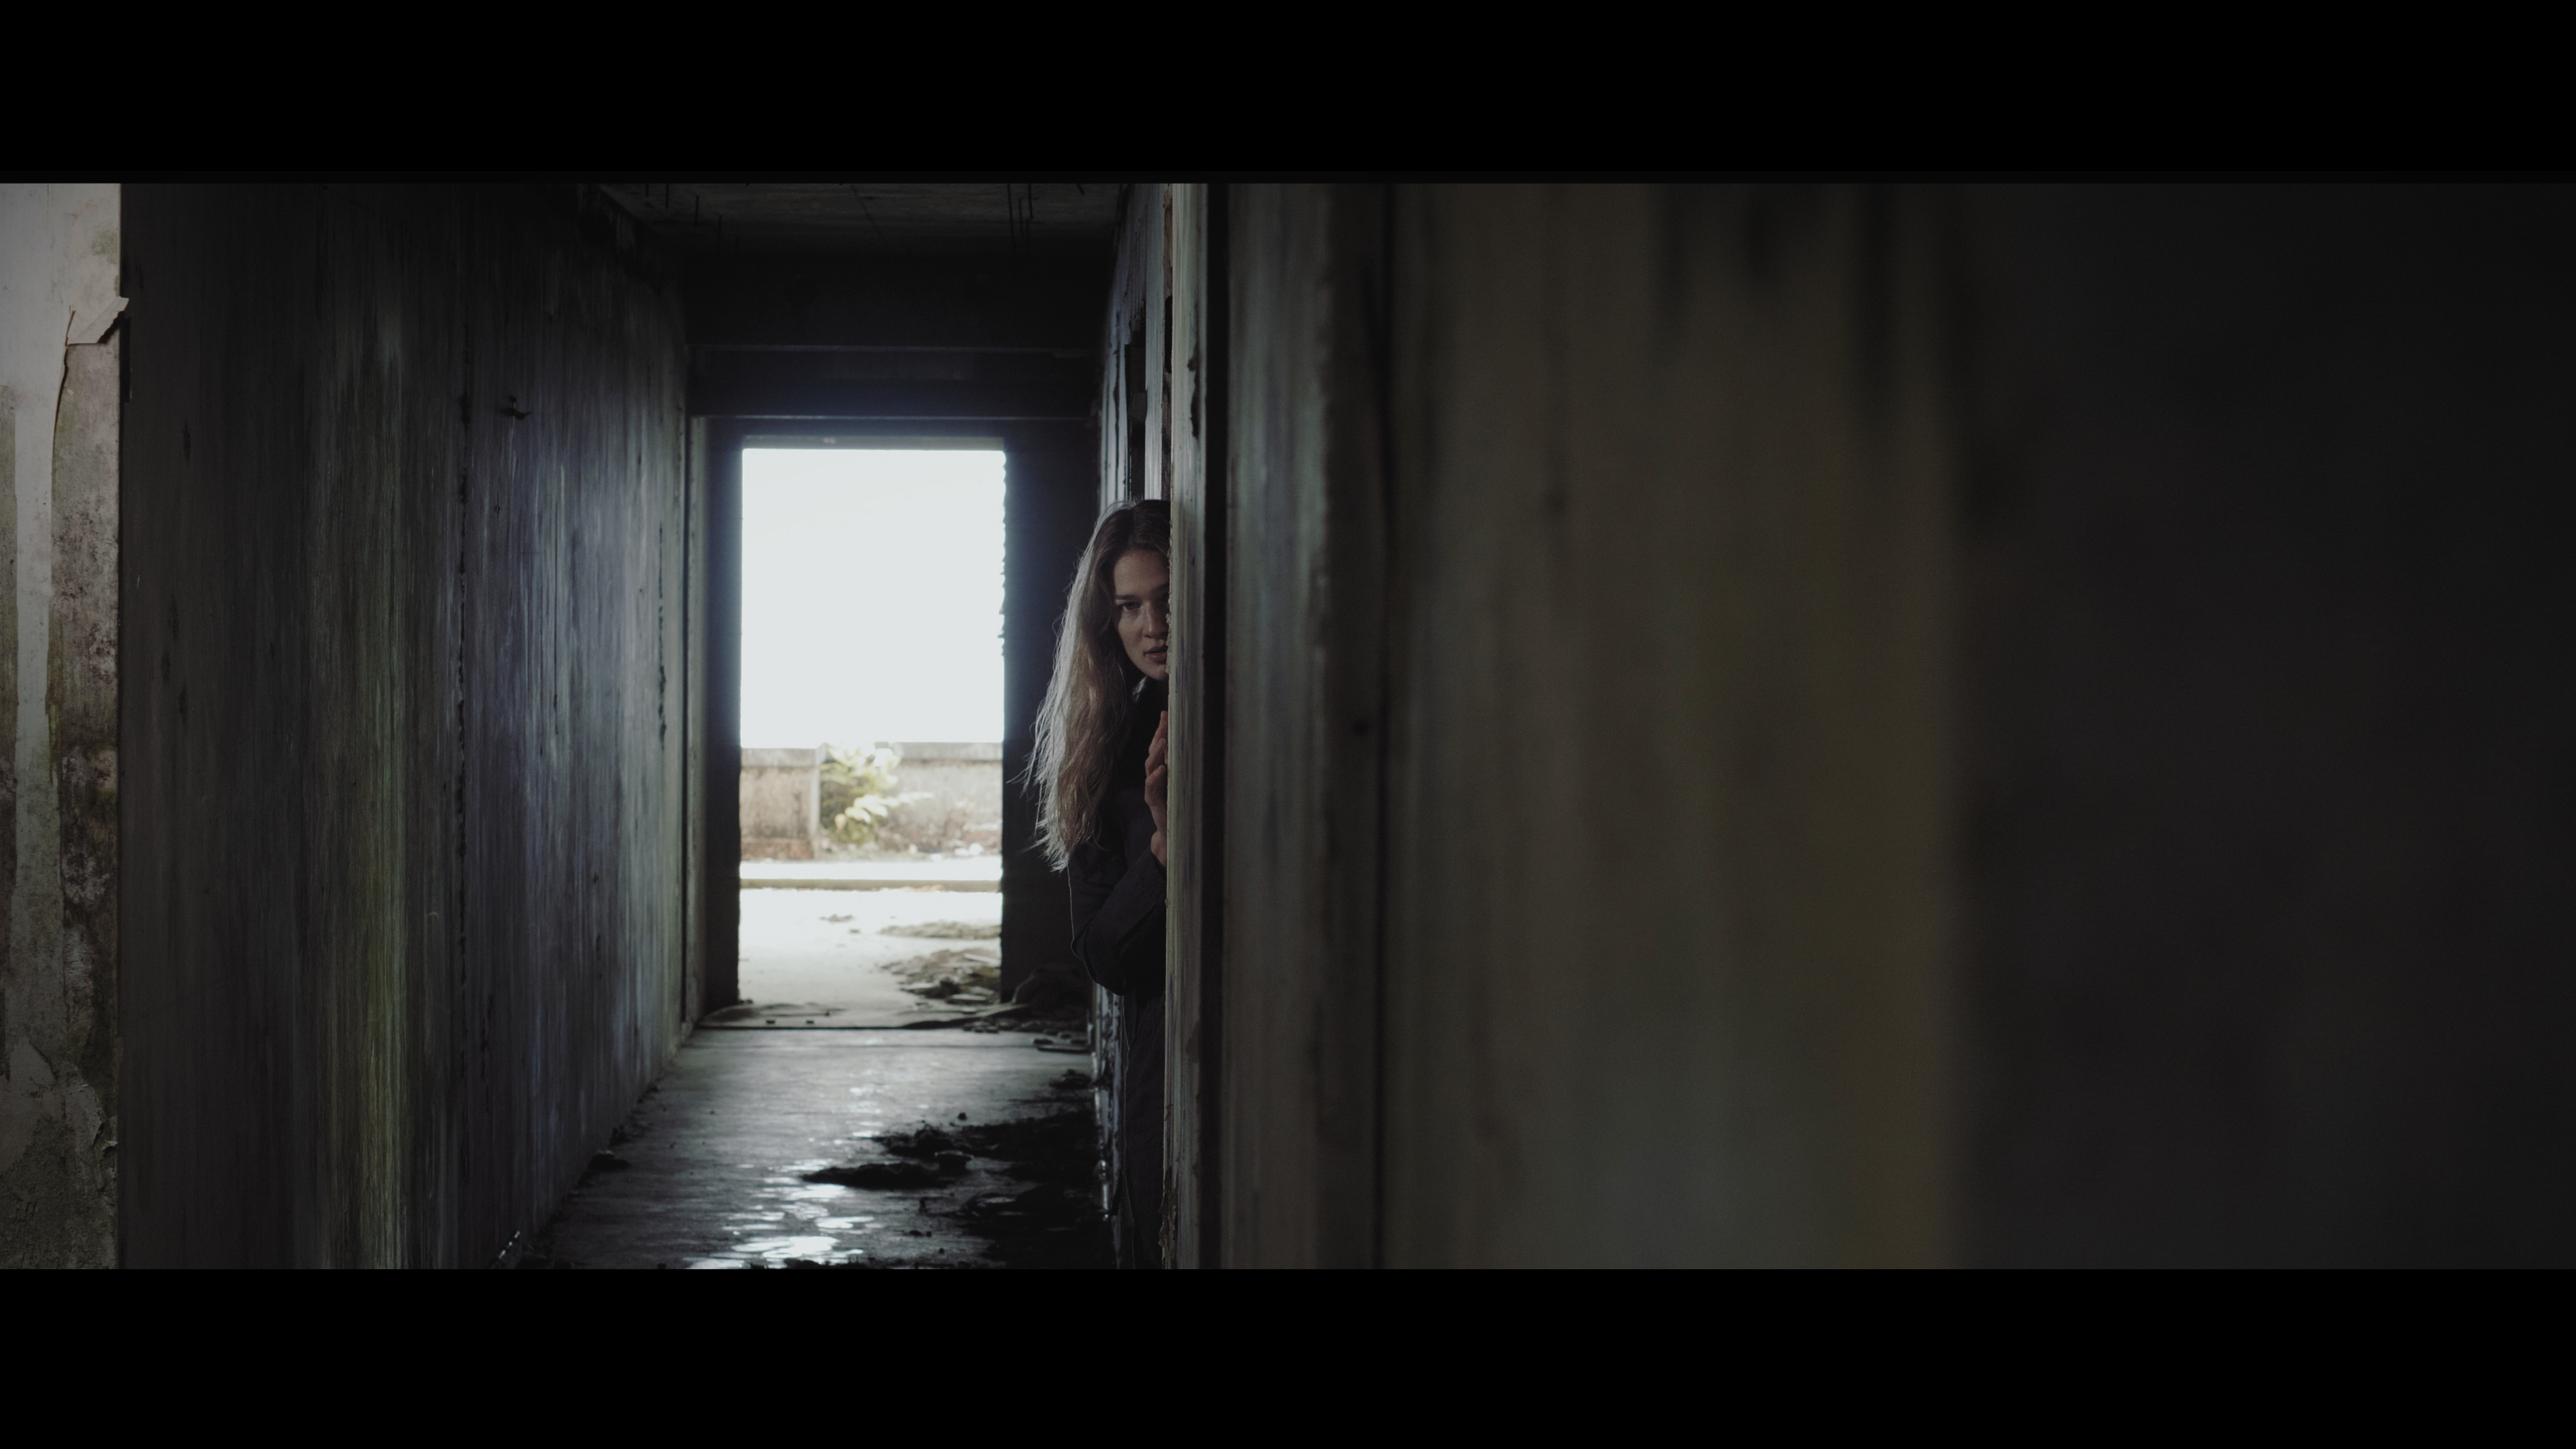 Viscera - Movement Film